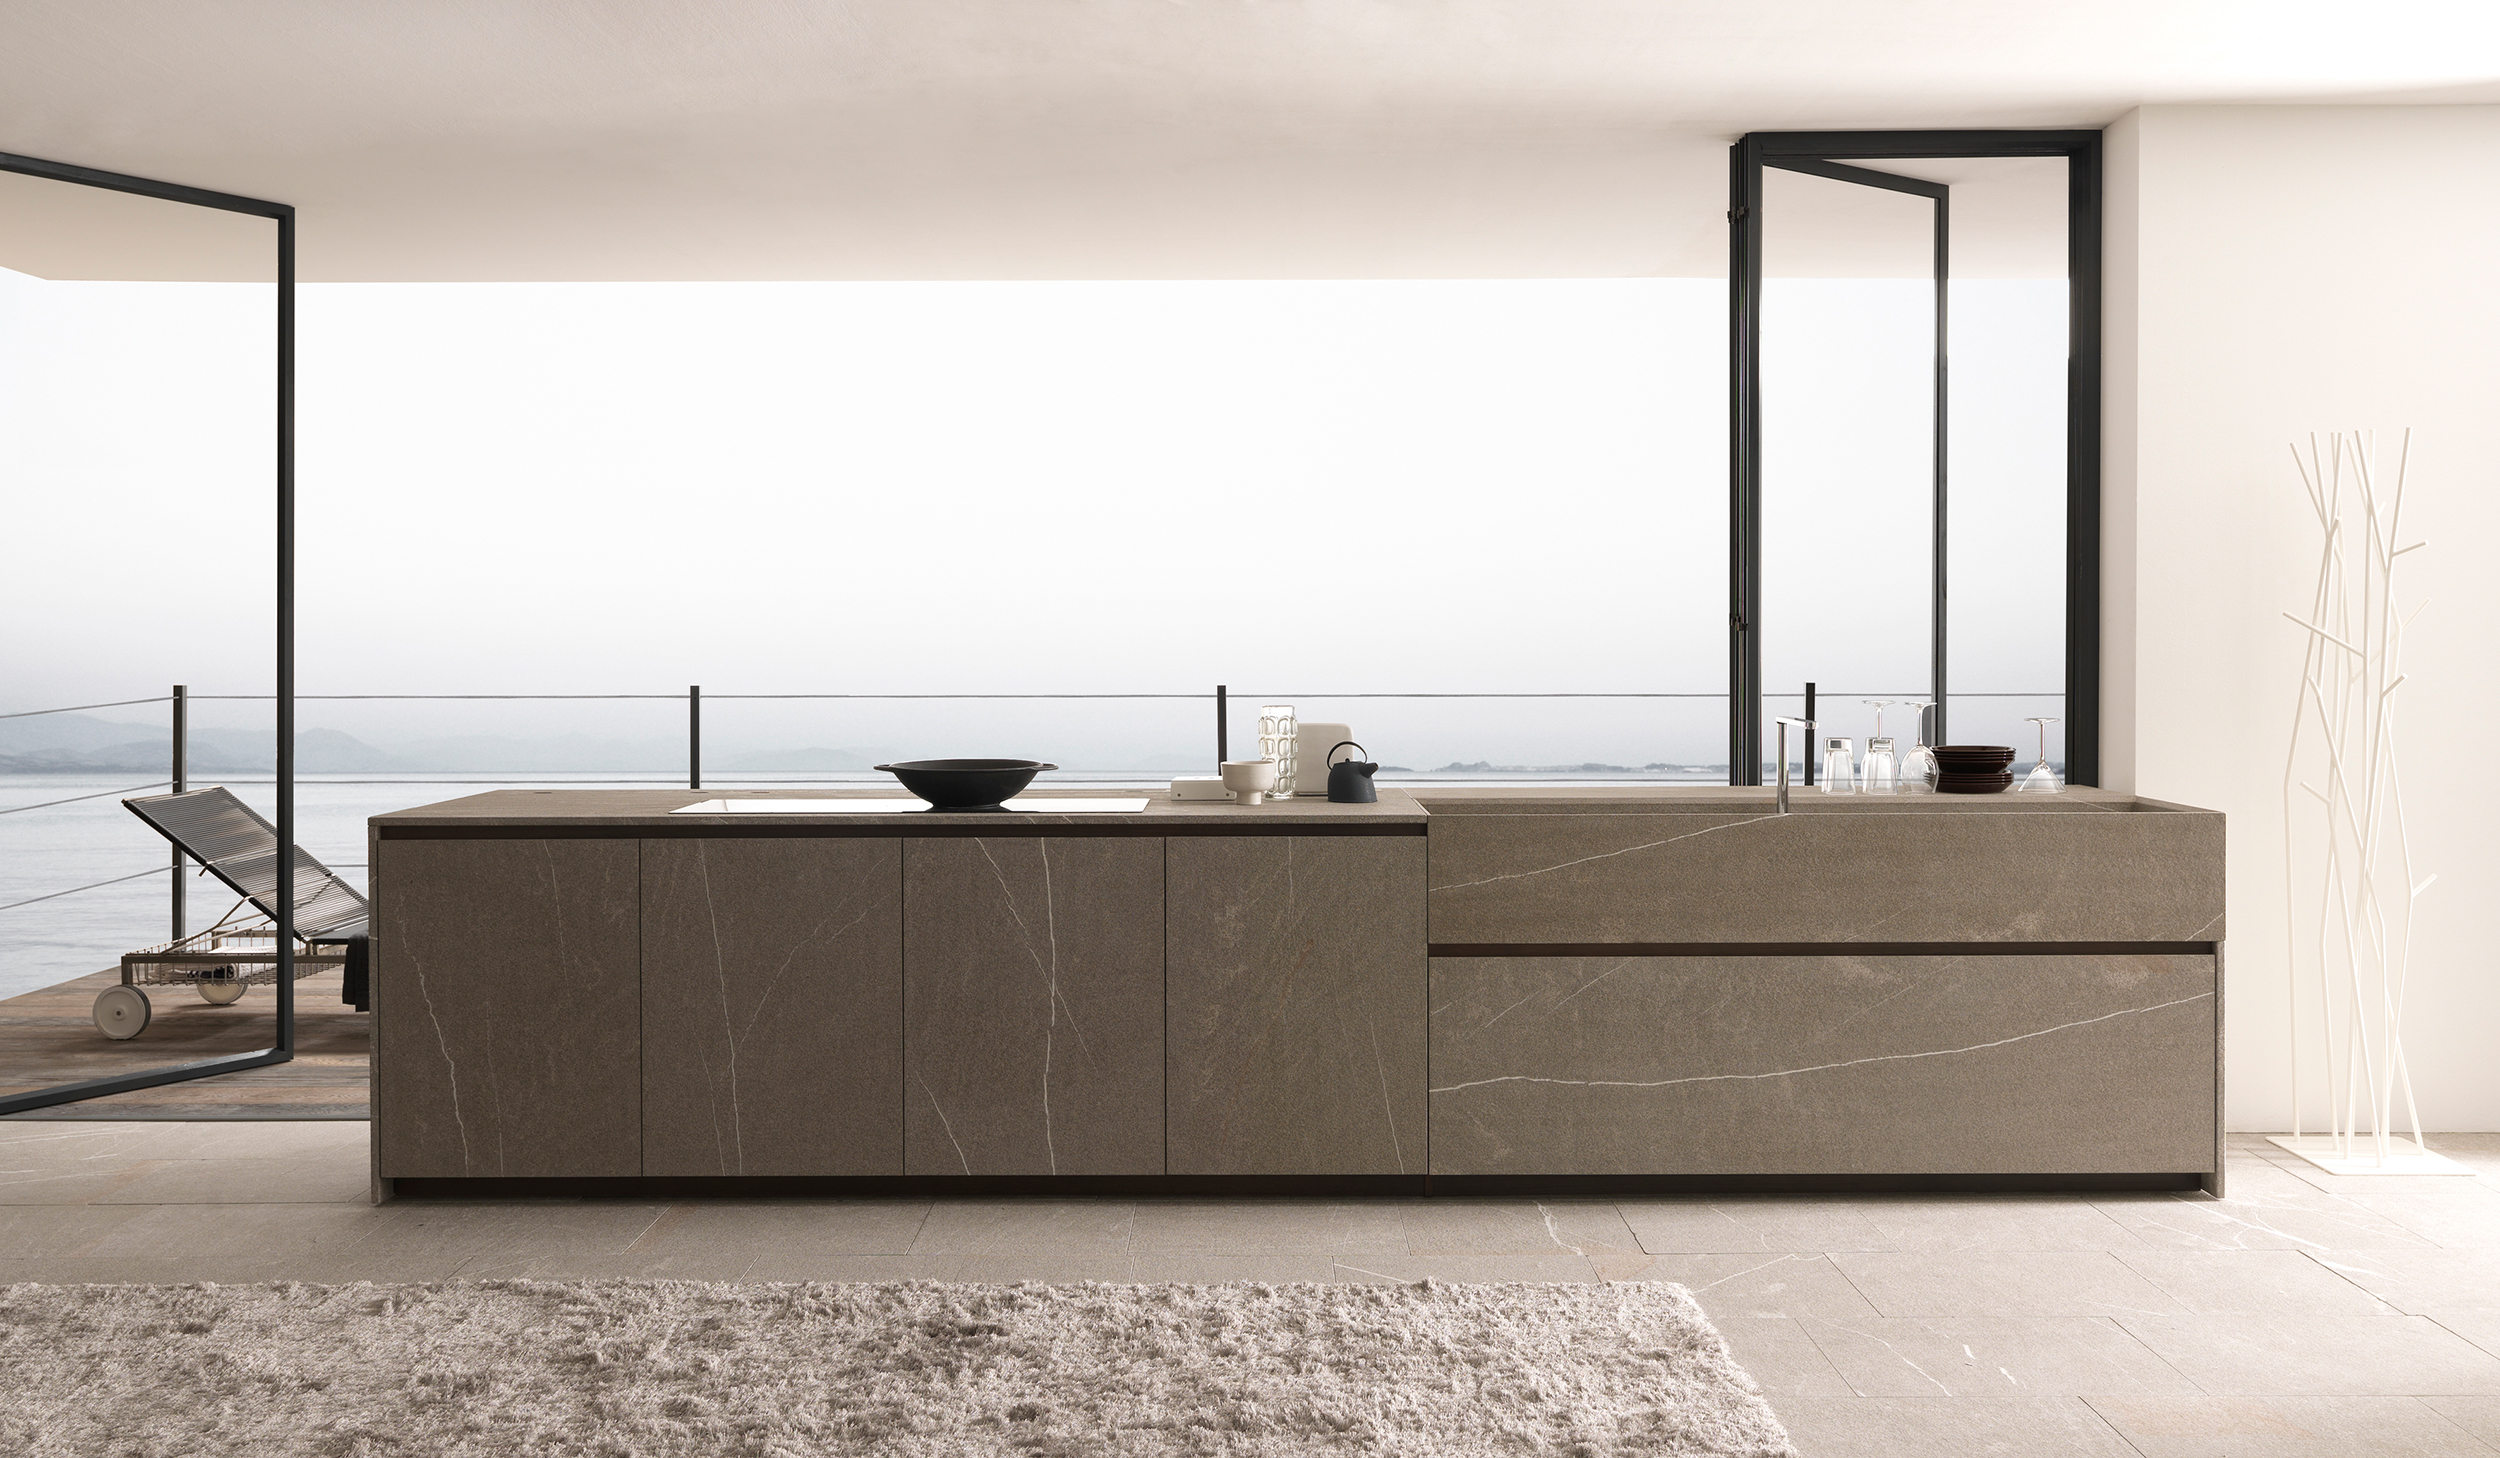 Italiaans keukendesign twenty modulnova flagshipstore